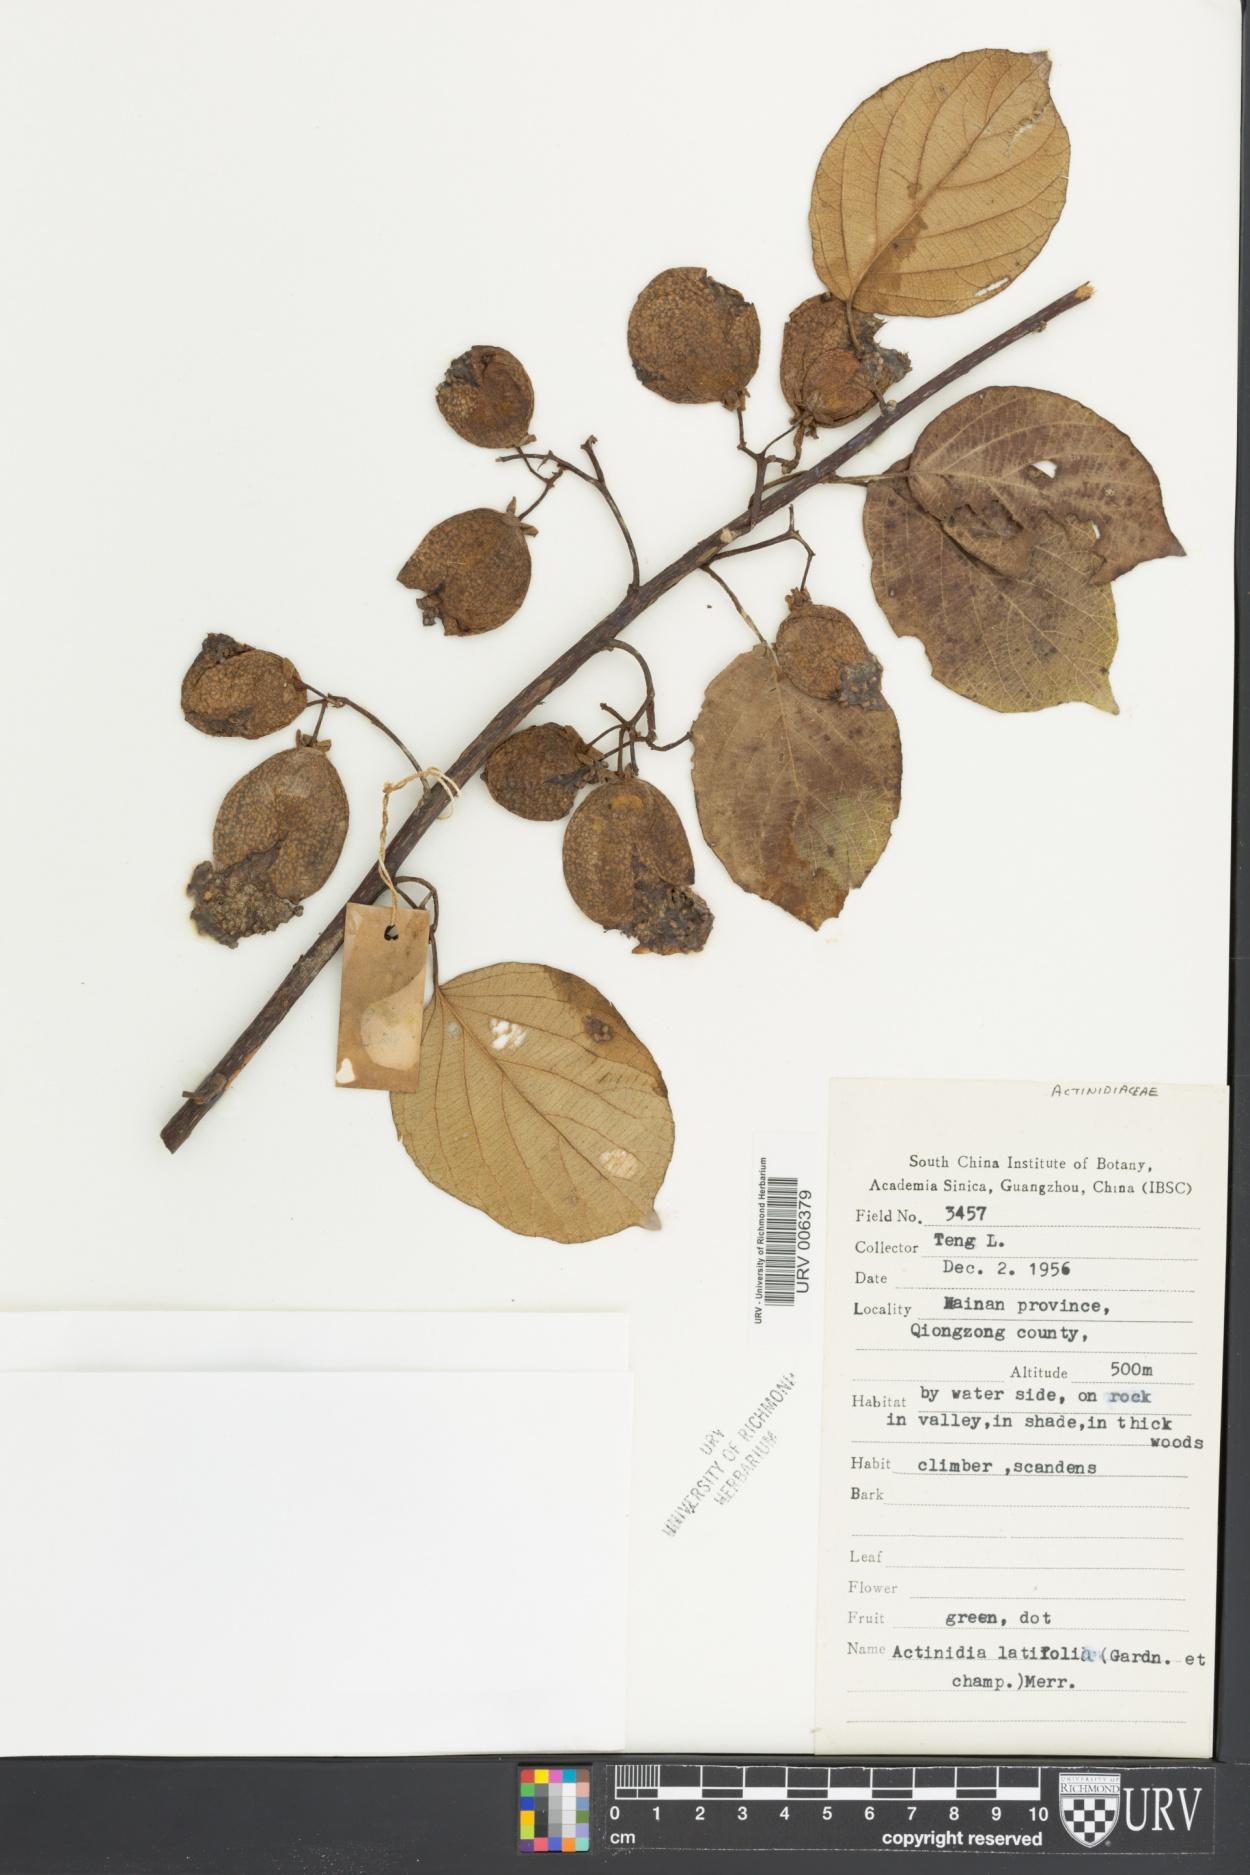 Actinidia latifolia image